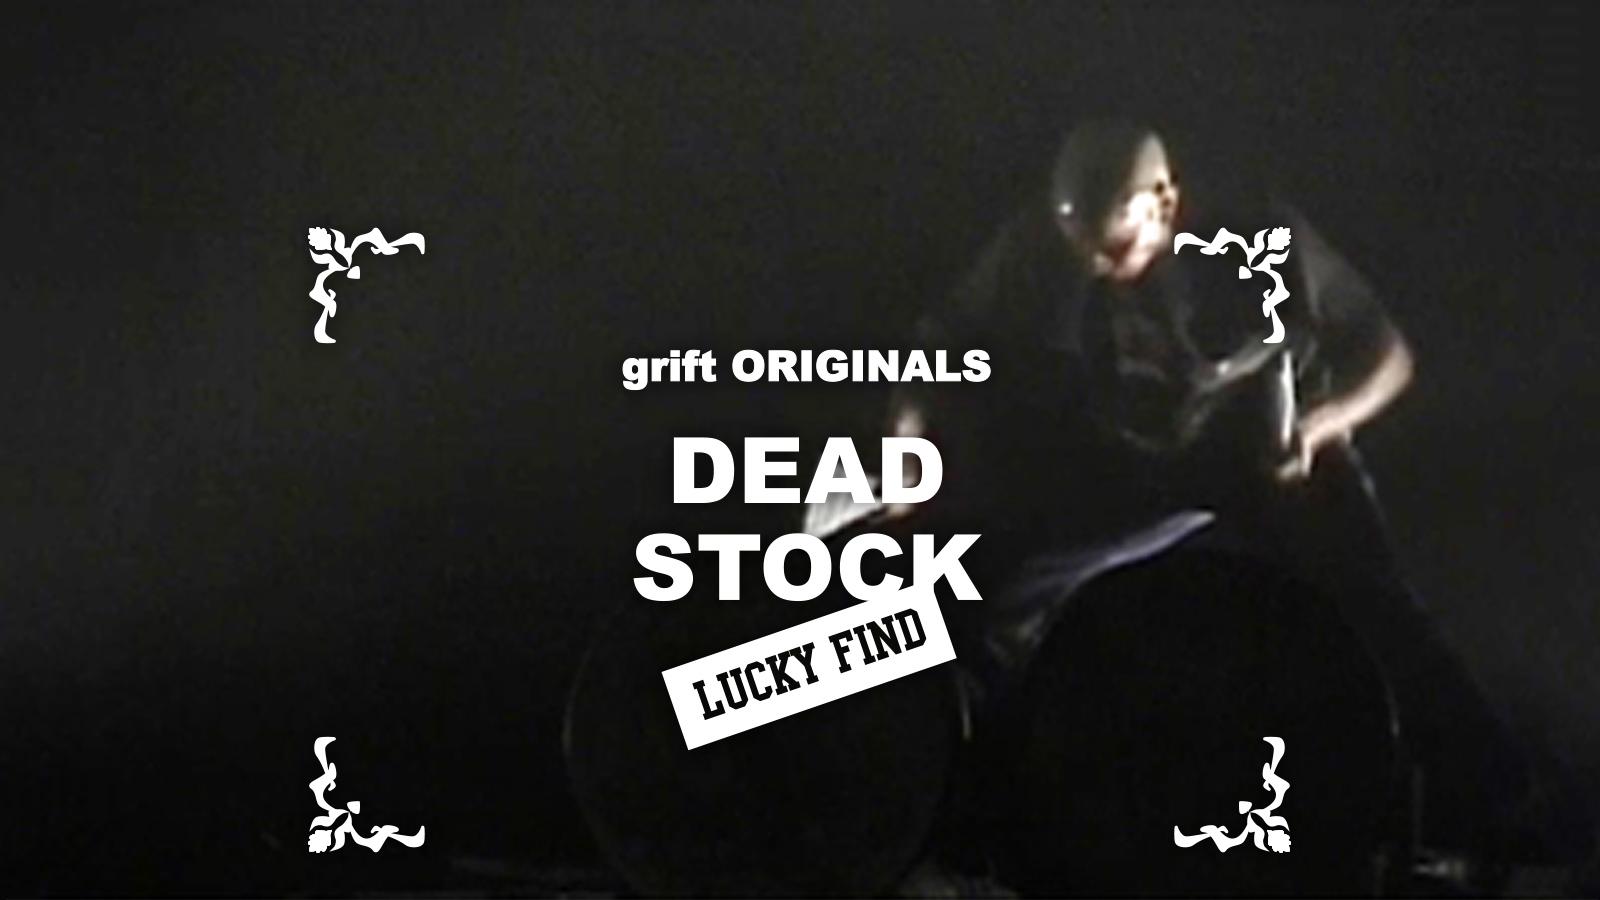 DEAD STOCK SALE